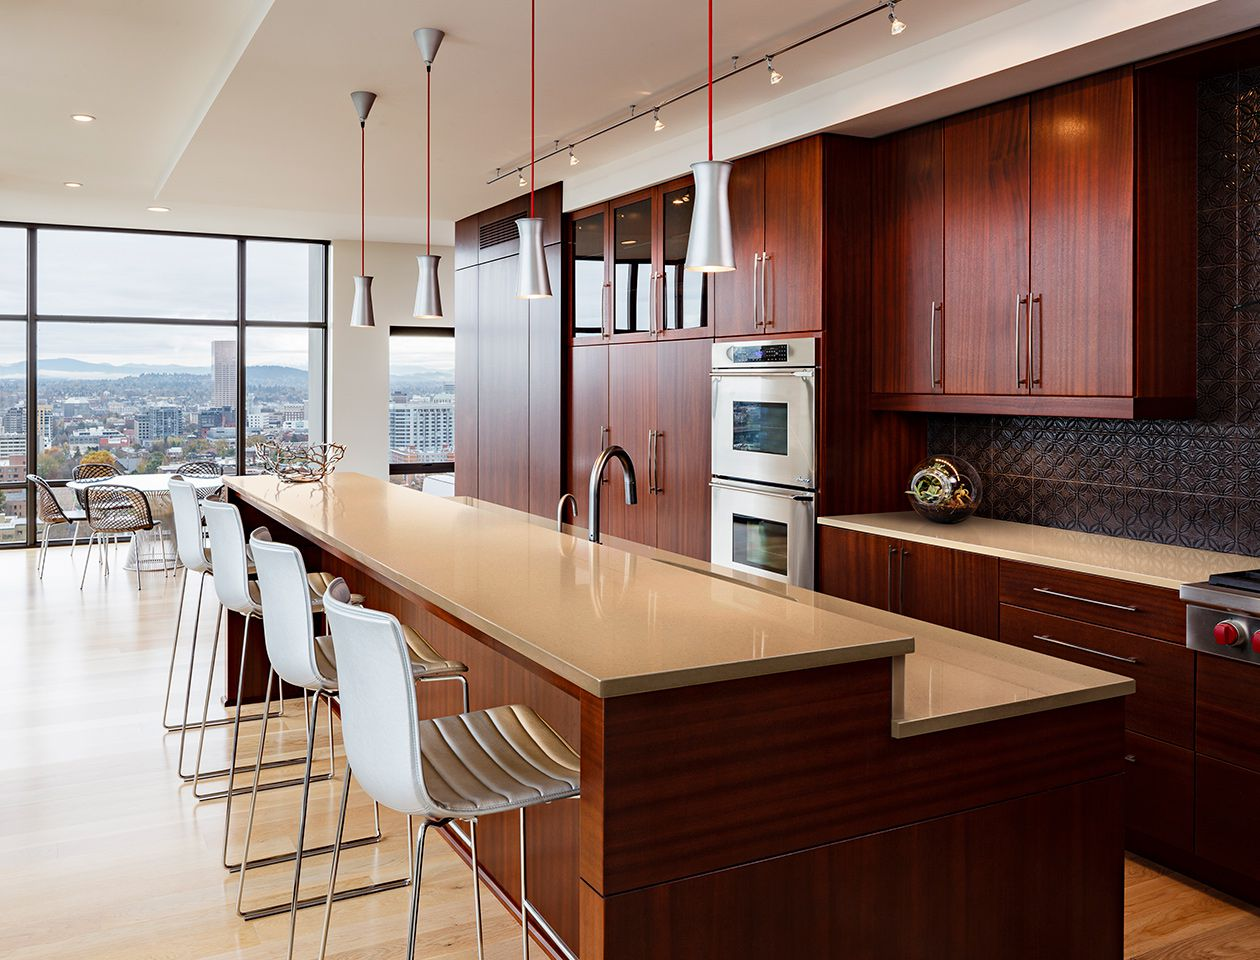 Quartz countertop brands comparison guide - Kitchen countertop designs photos ...